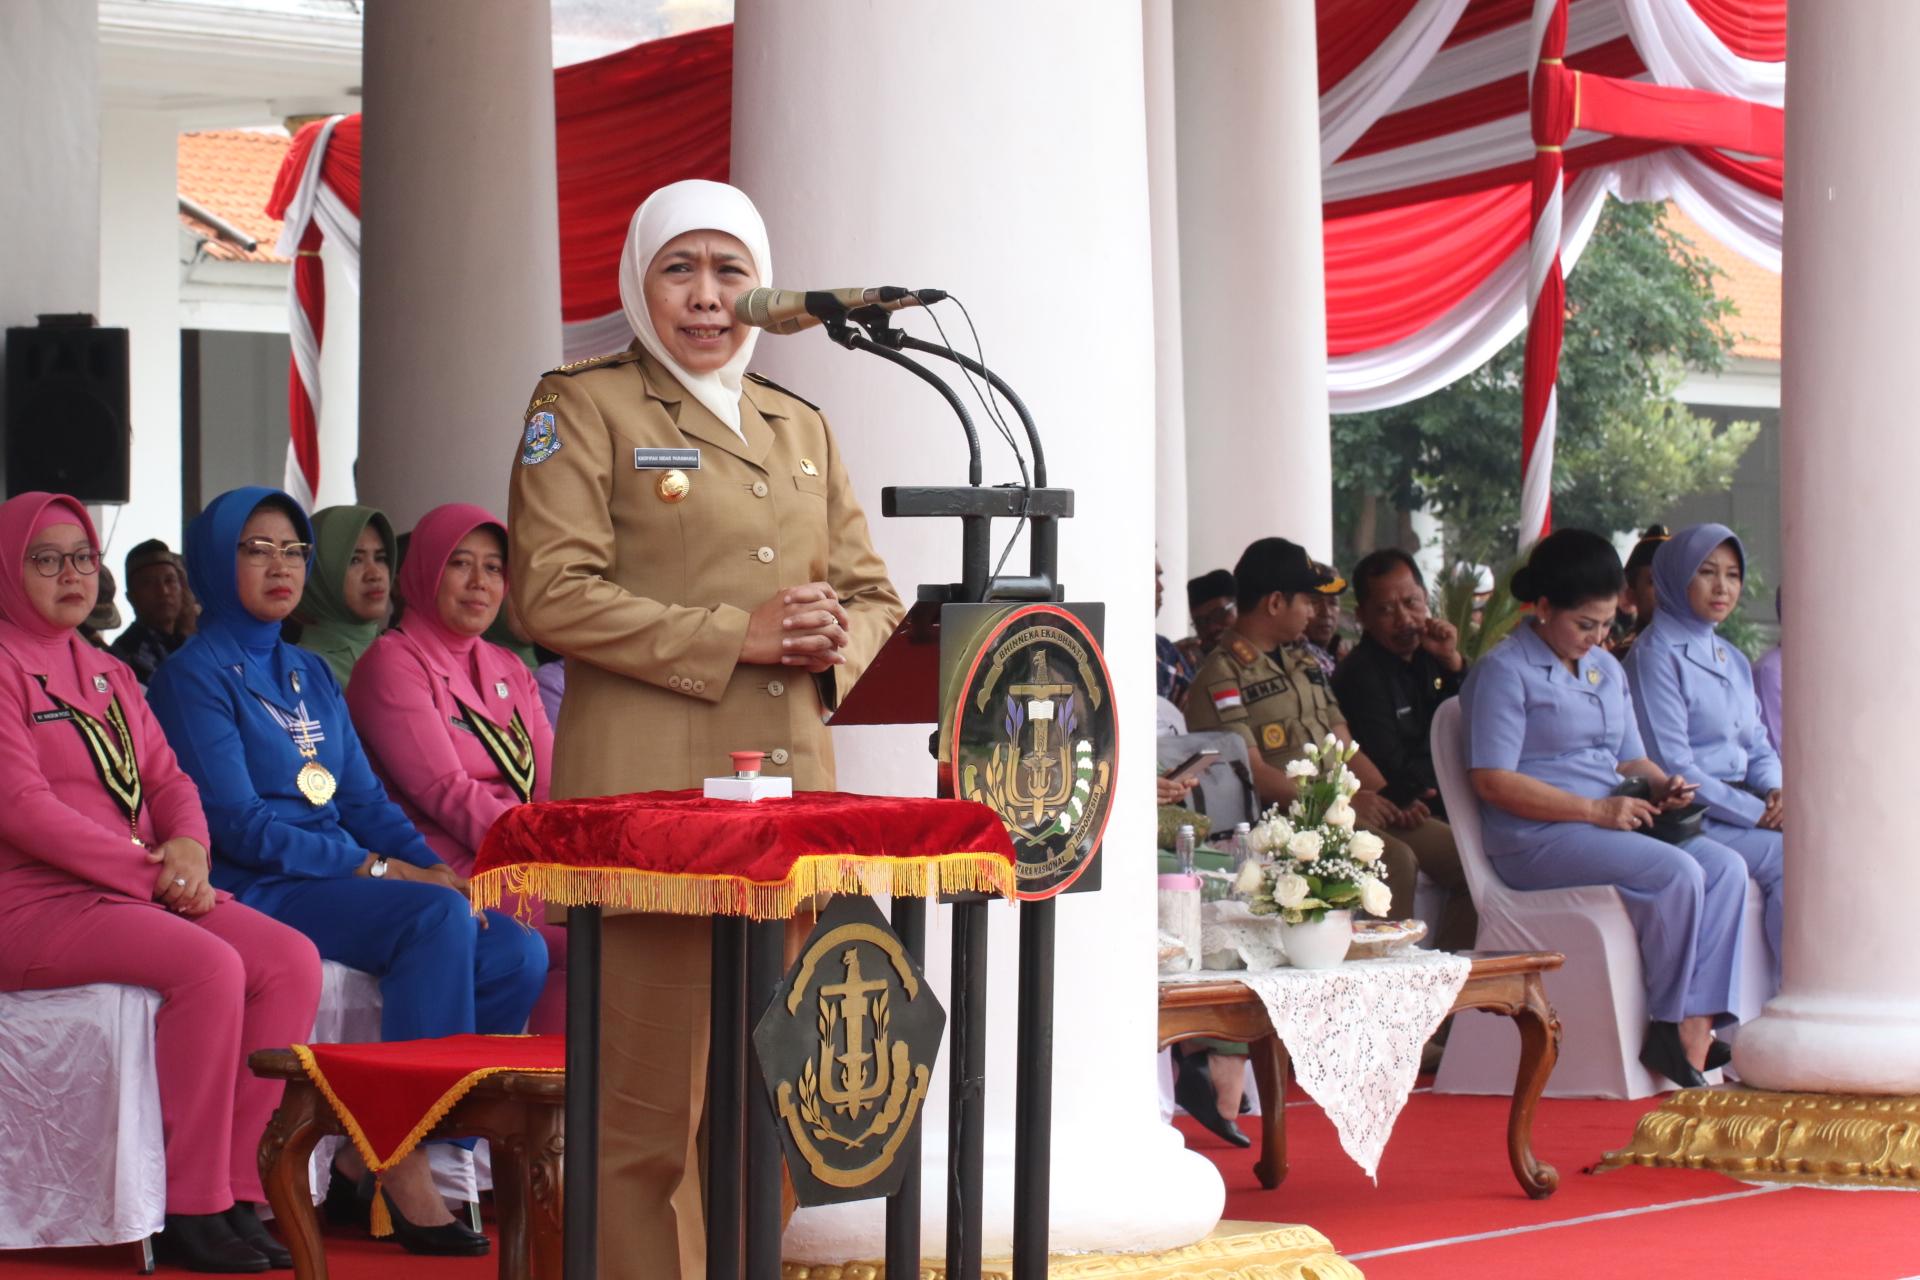 Gubernur Khofifah Minta Dinas Terkait Segera Tangani Gadis Penderita Gangguan Jiwa Asal Kediri